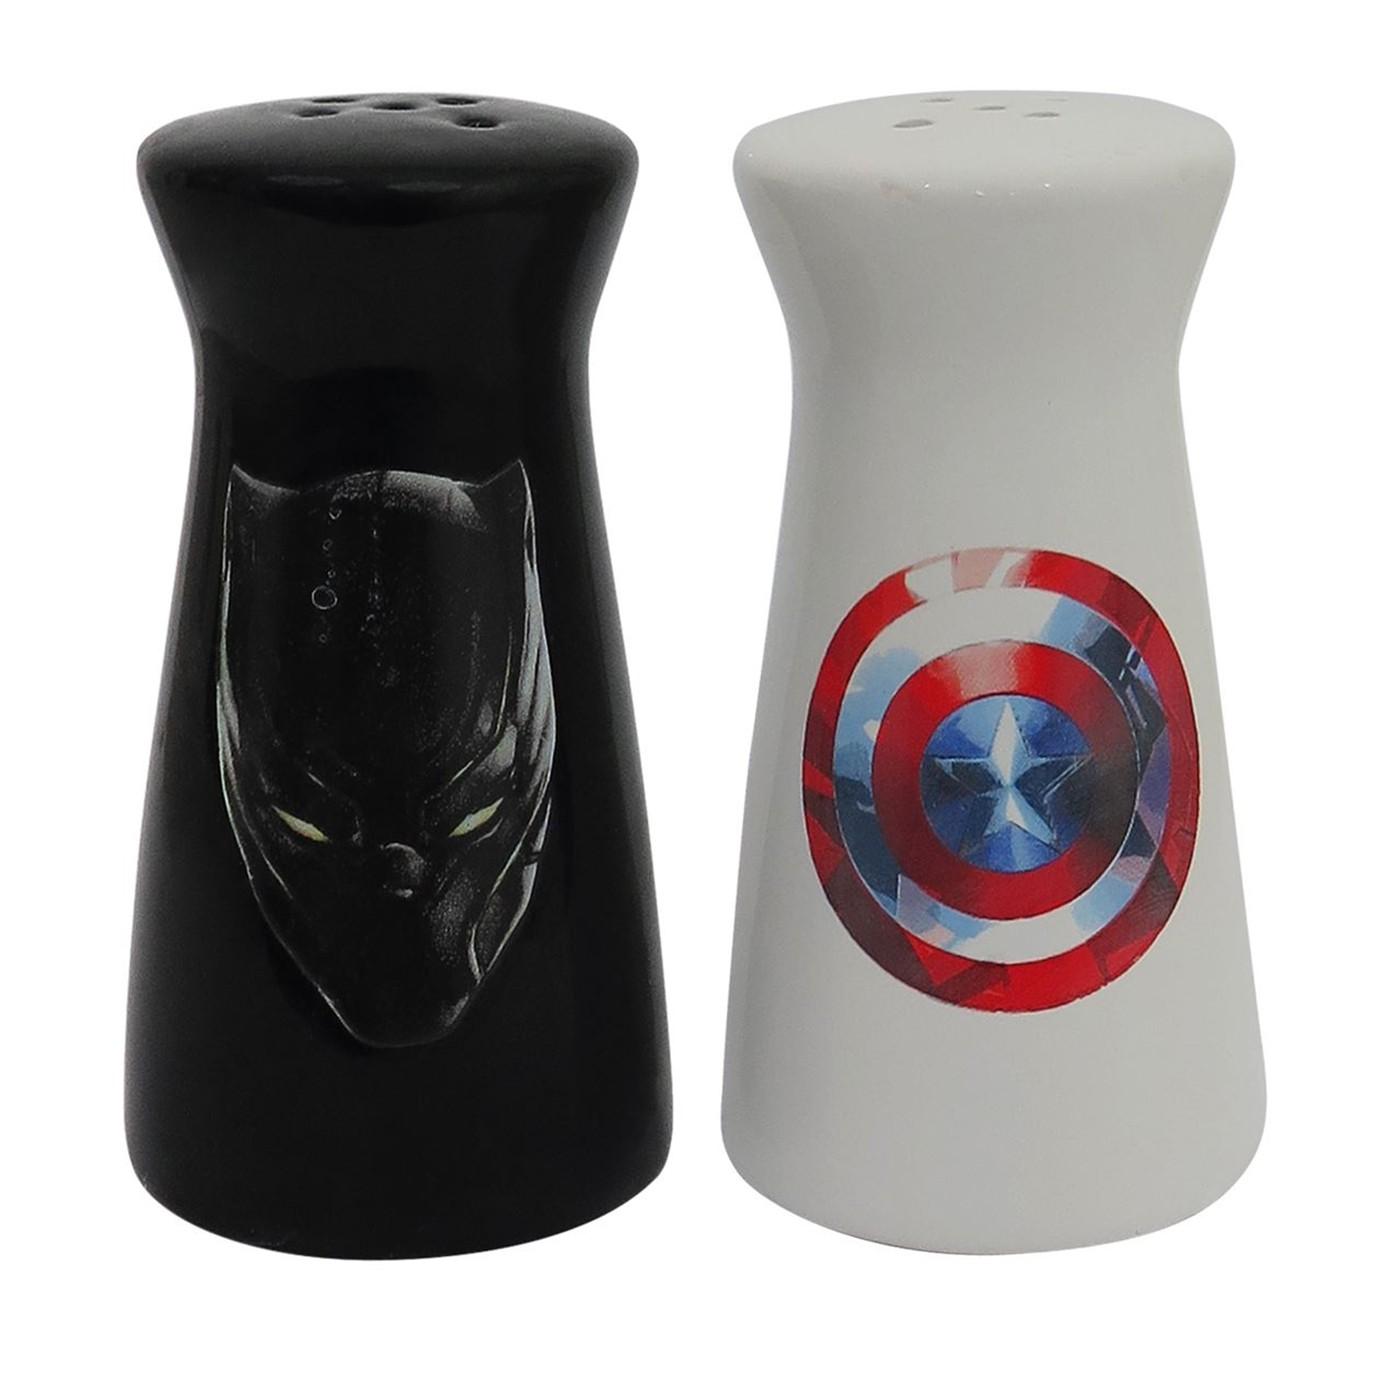 Captain America Black Panther Salt & Pepper Shakers